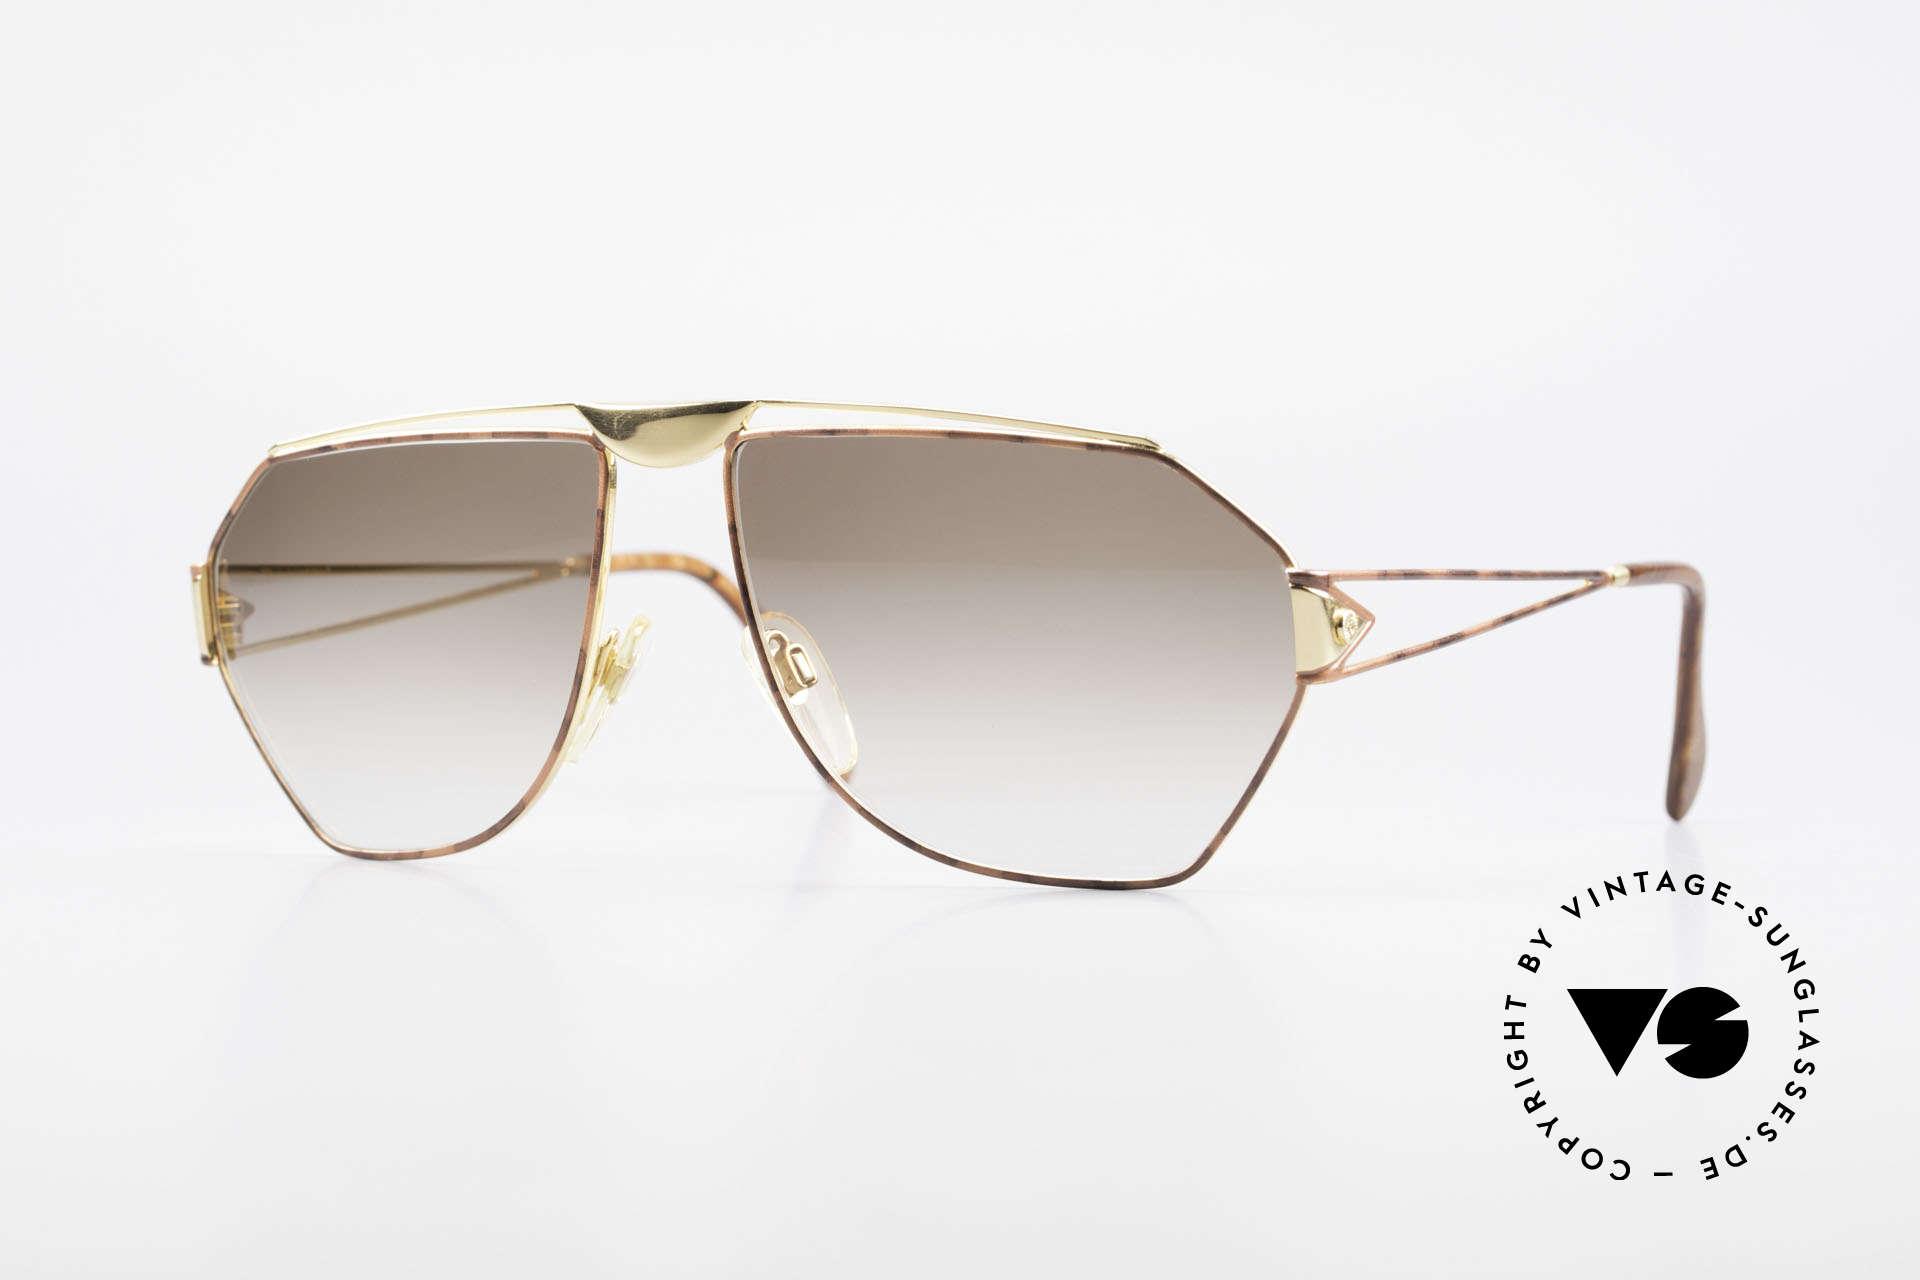 St. Moritz 403 80er Jupiter Sonnenbrille Rar, sensationelle vintage St. Moritz Designer-Sonnenbrille, Passend für Herren